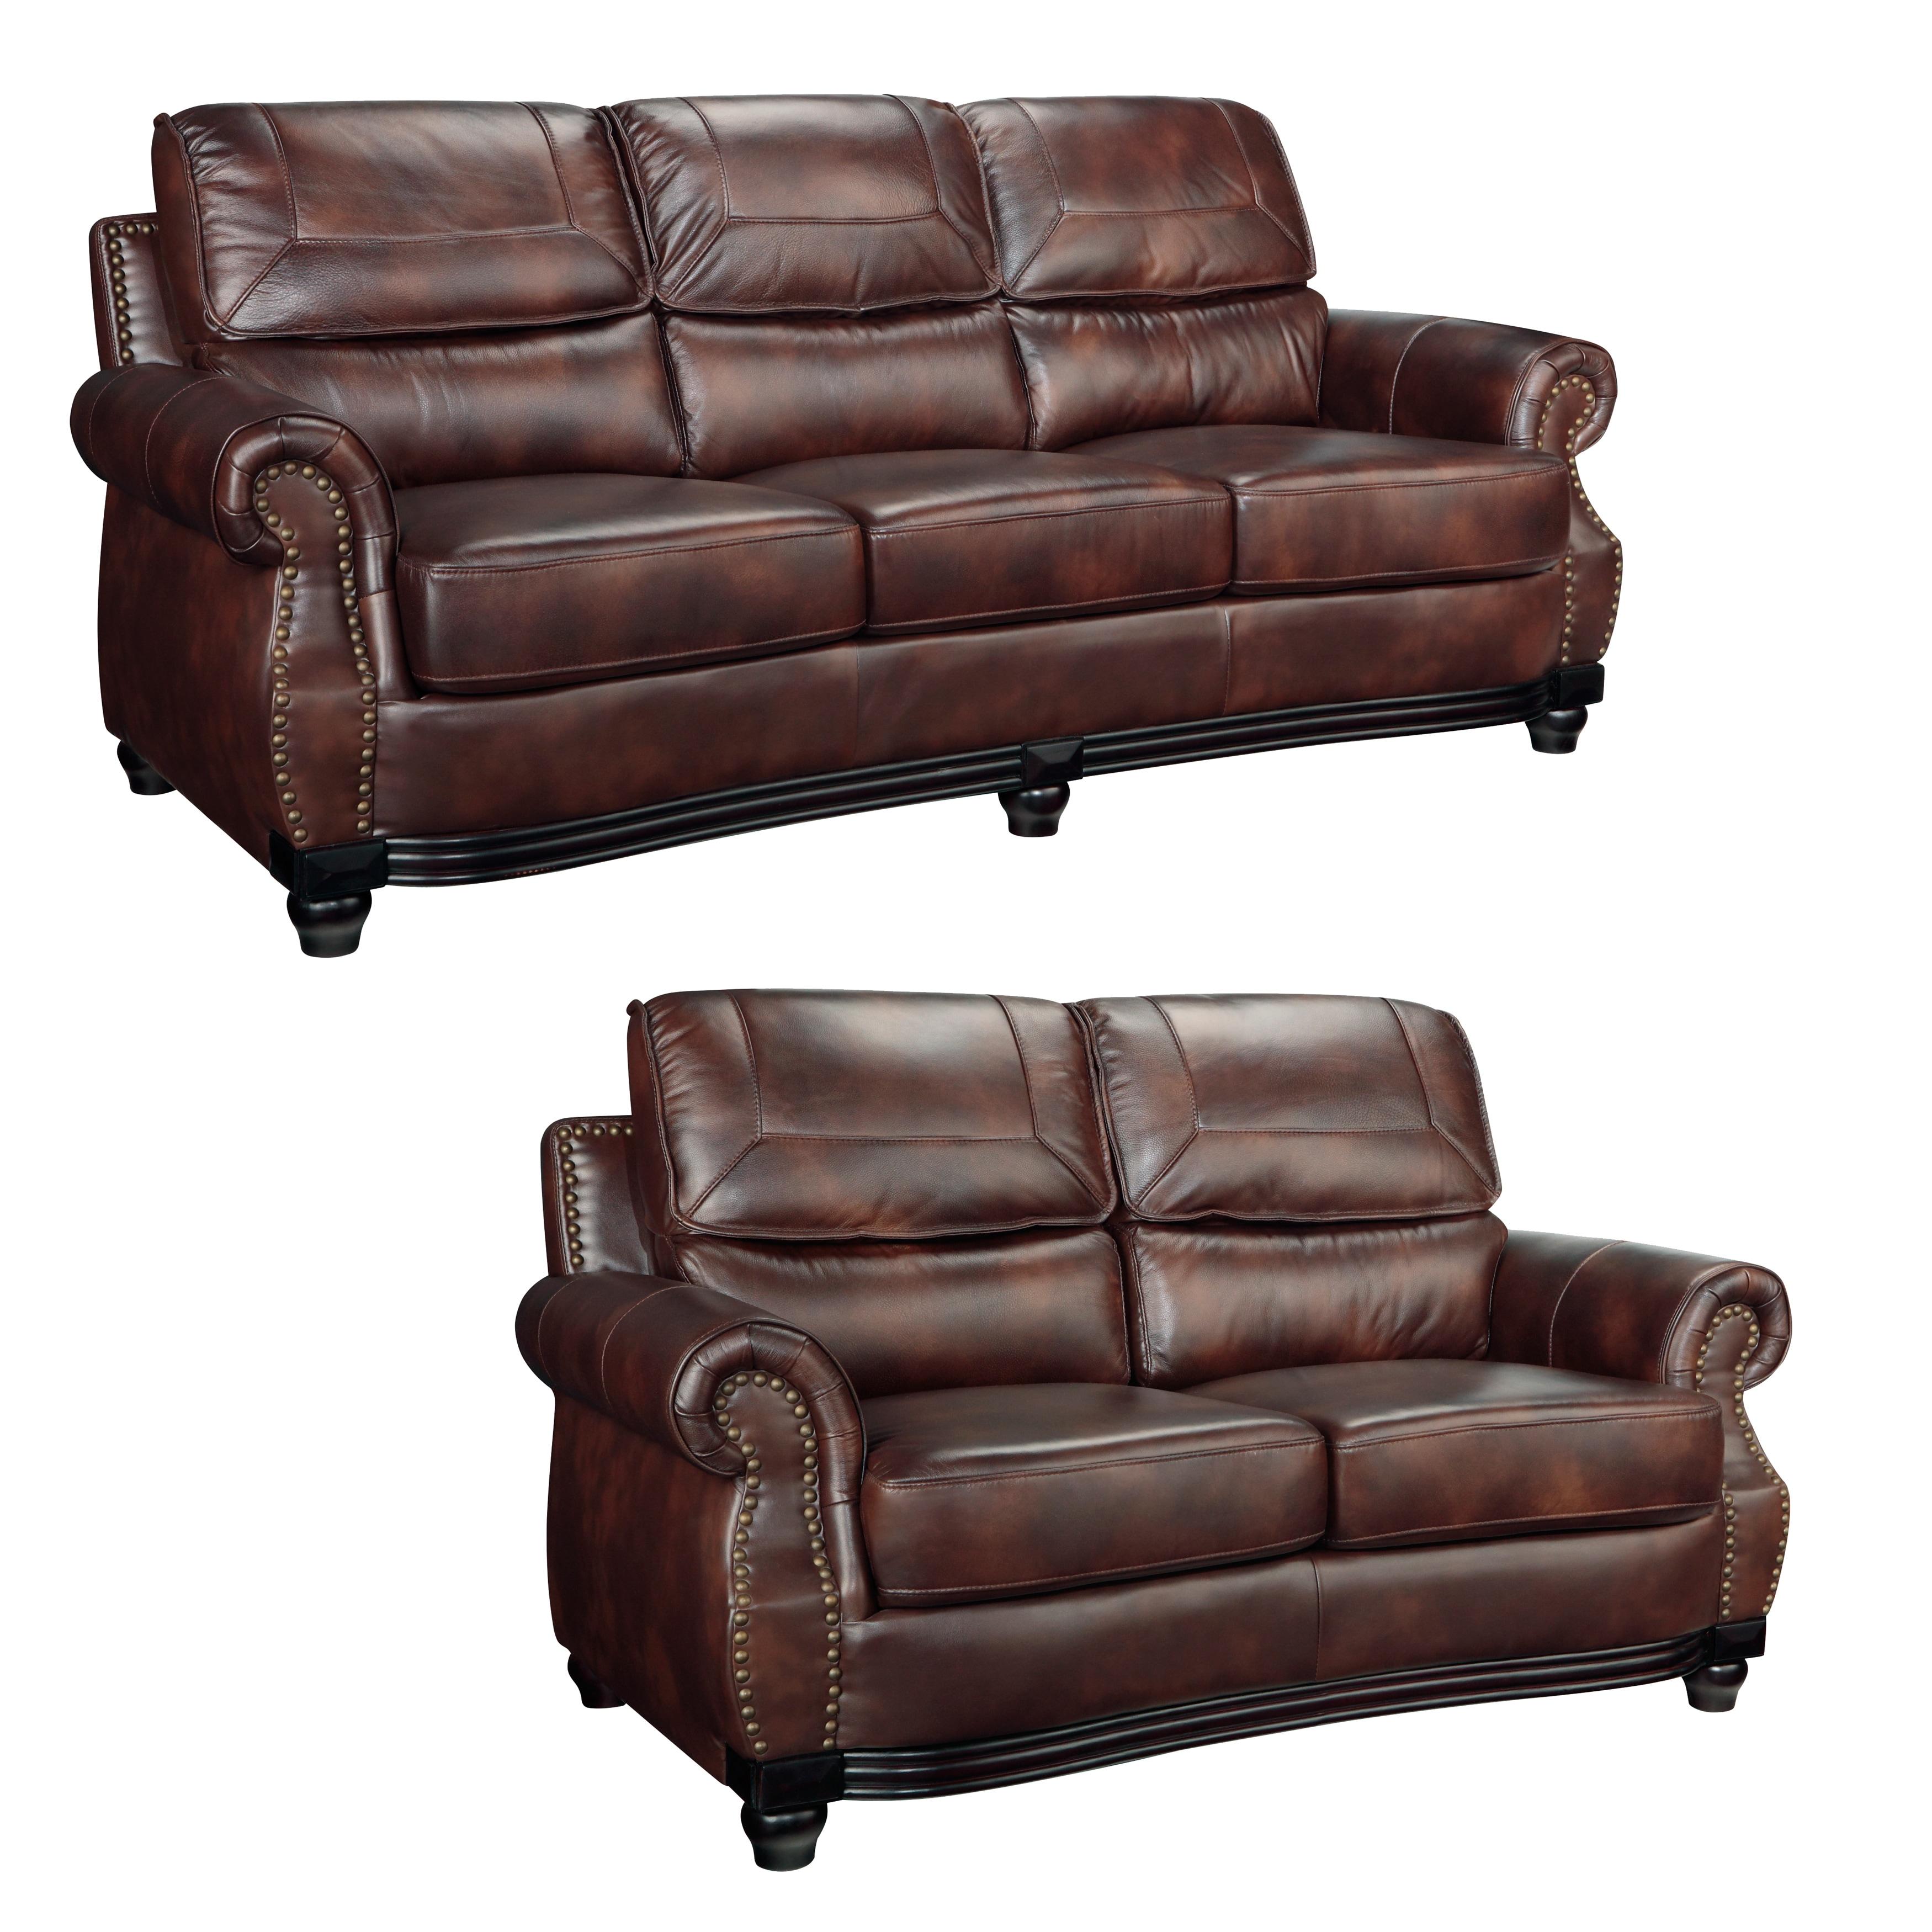 Fantastic Maverick Cocoa Brown Italian Leather Sofa And Loveseat Uwap Interior Chair Design Uwaporg